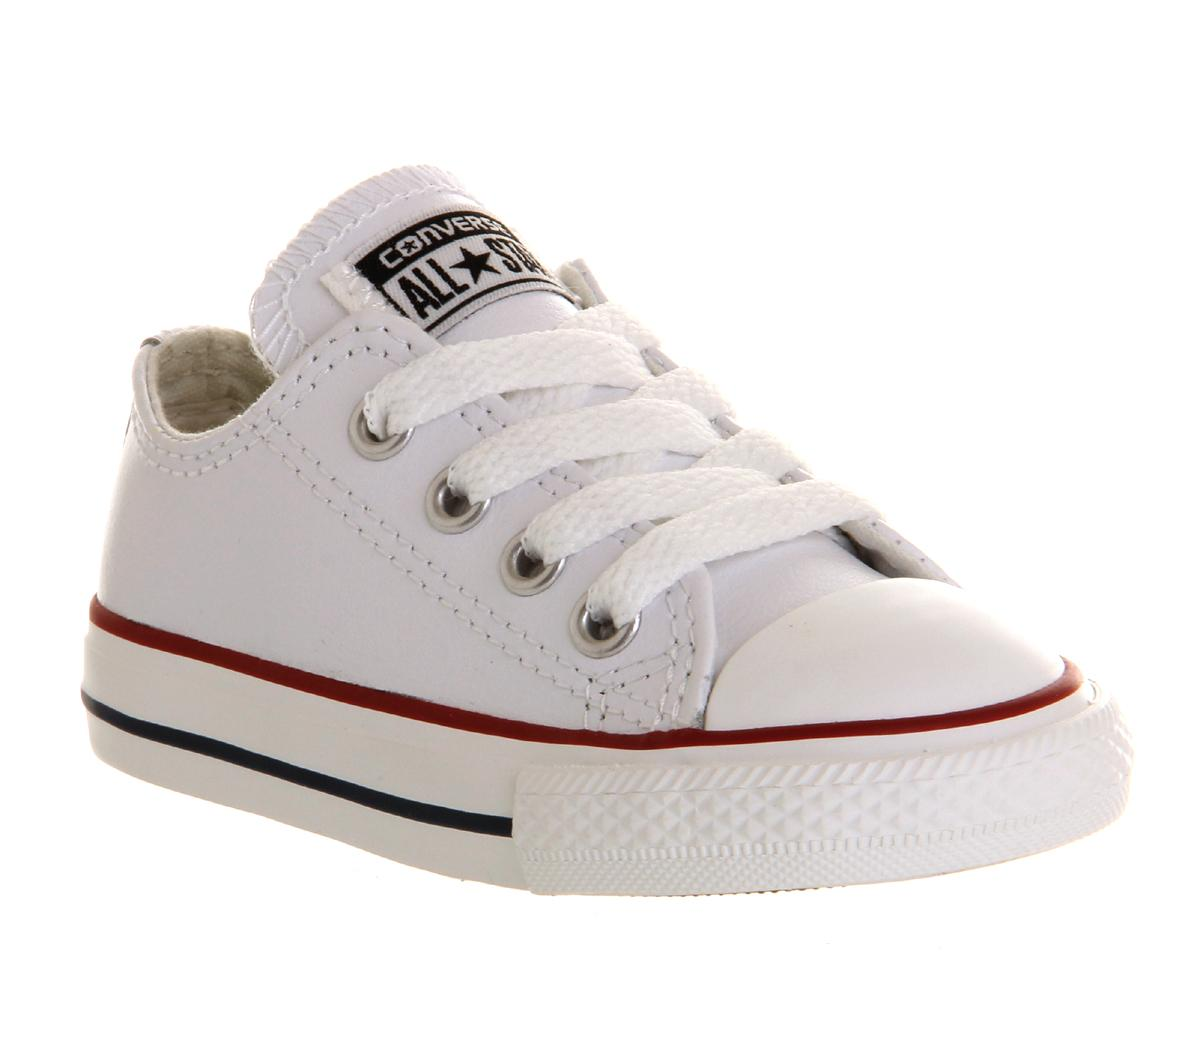 converse shoes for infants